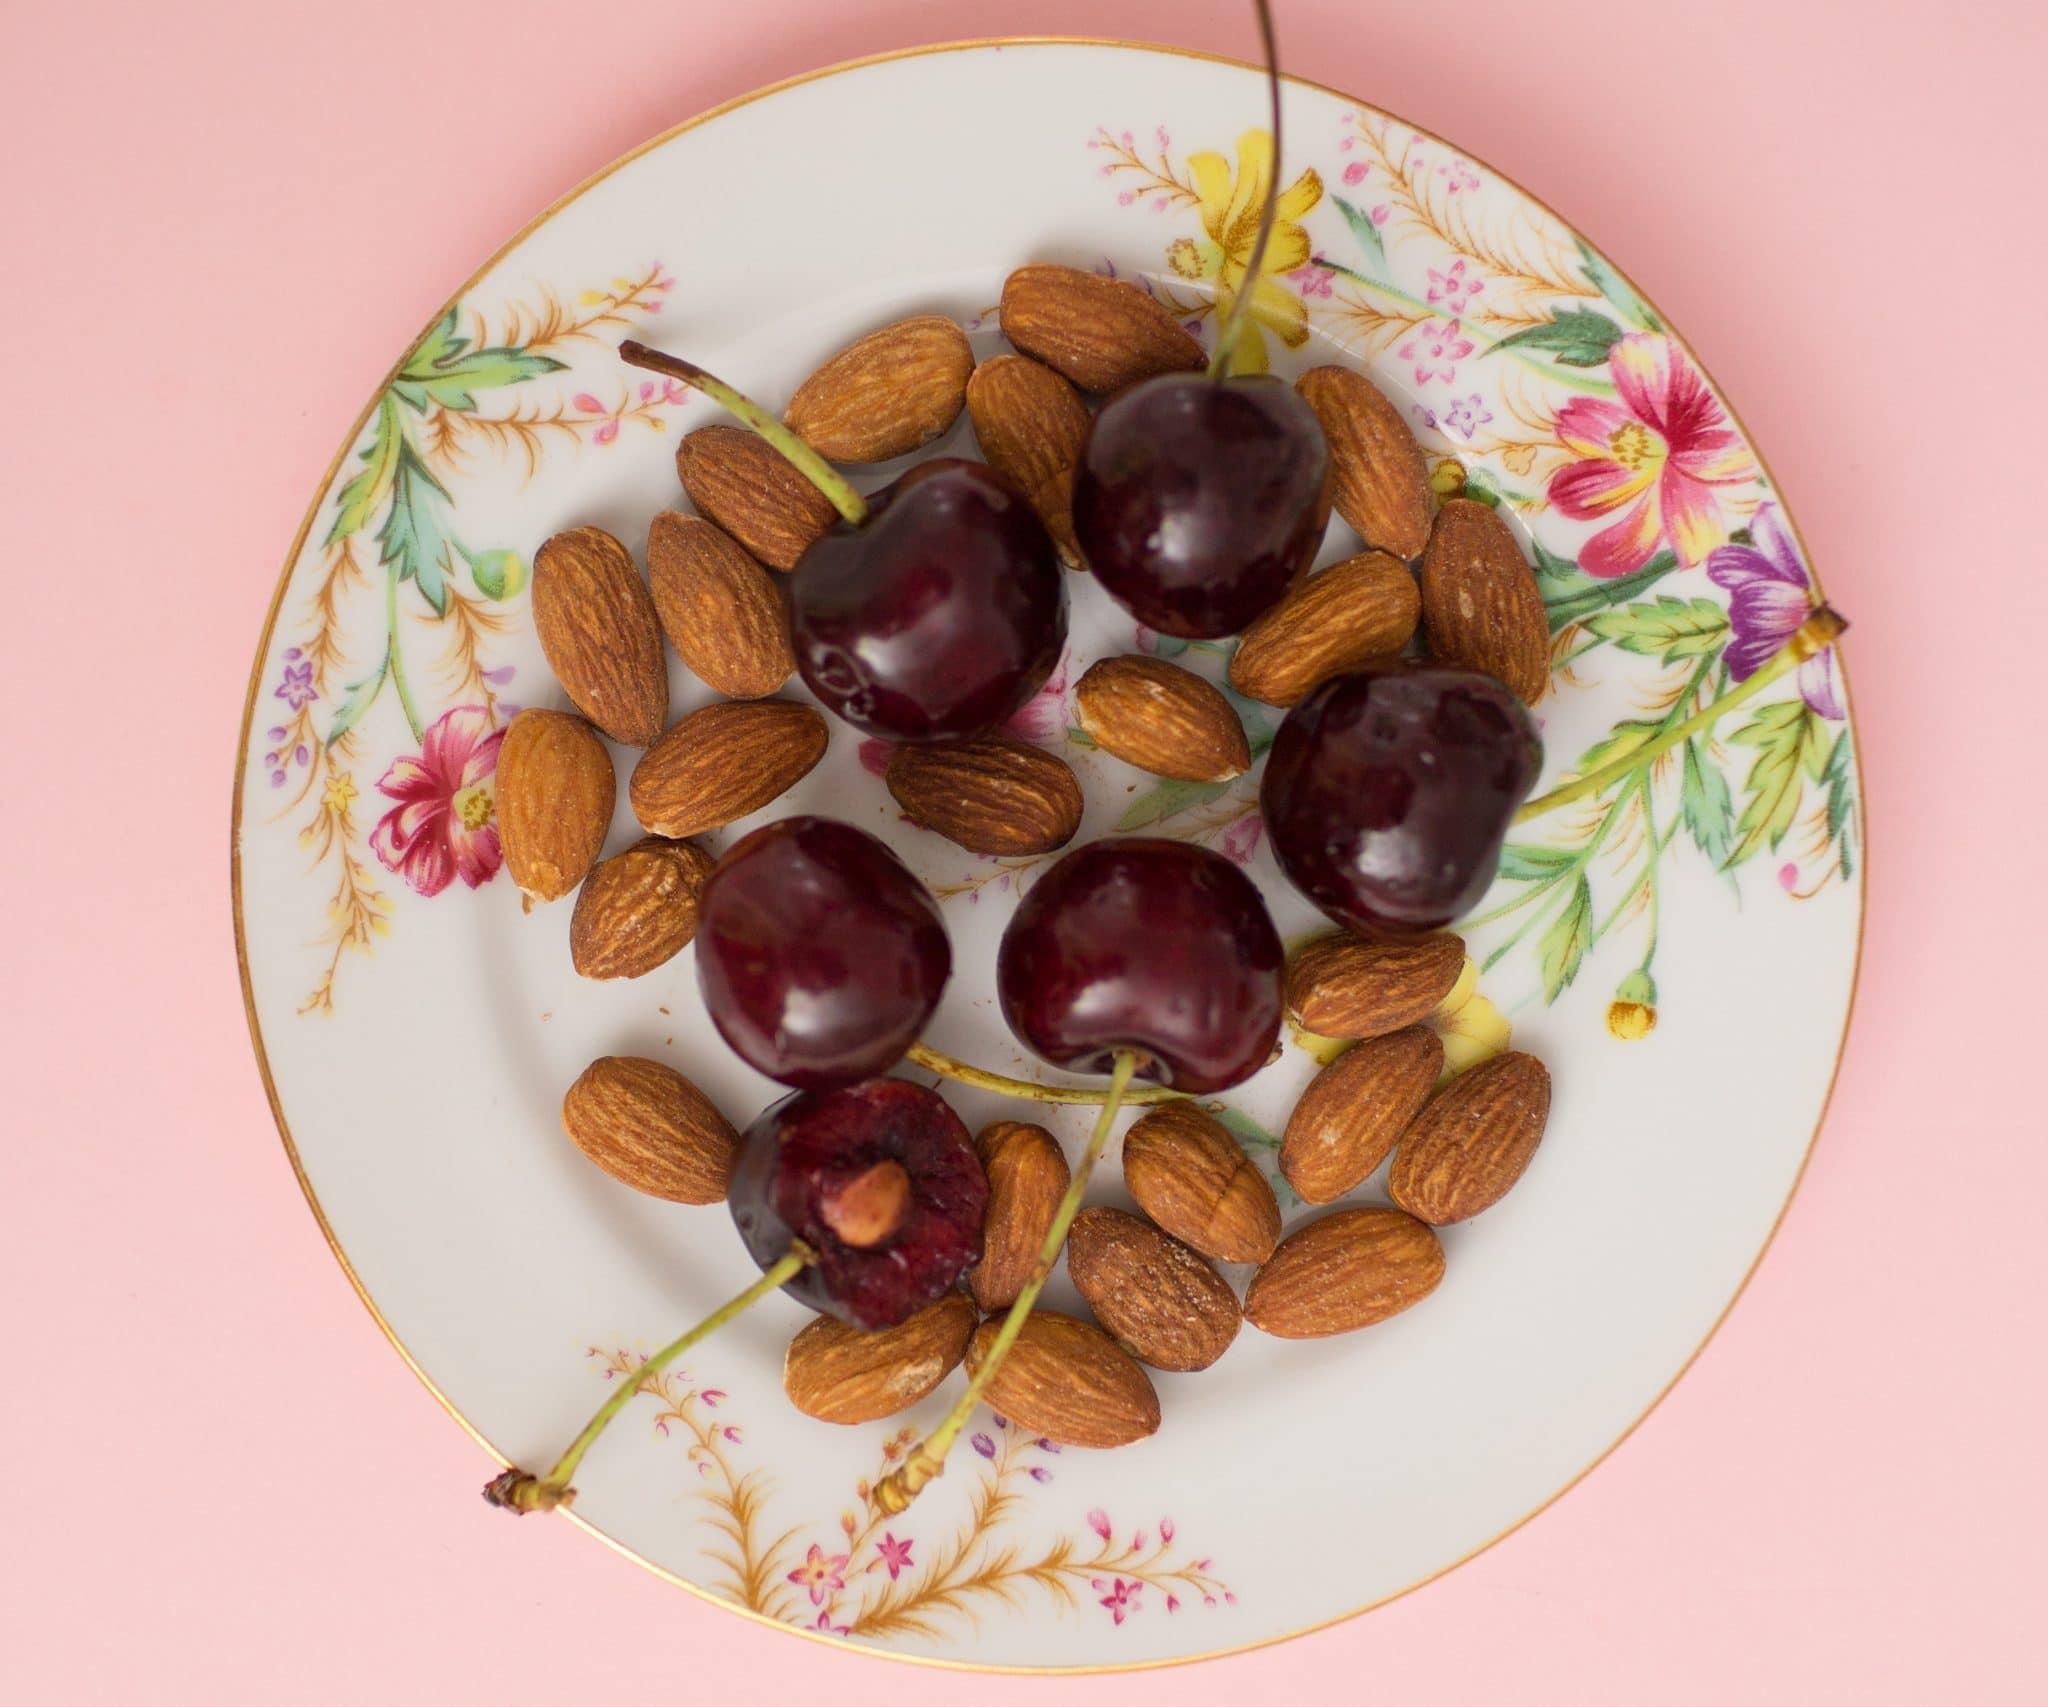 Blogger Ashley Brooke shares her six go-to healthy snacks! | www.ashleybrookedesigns.com